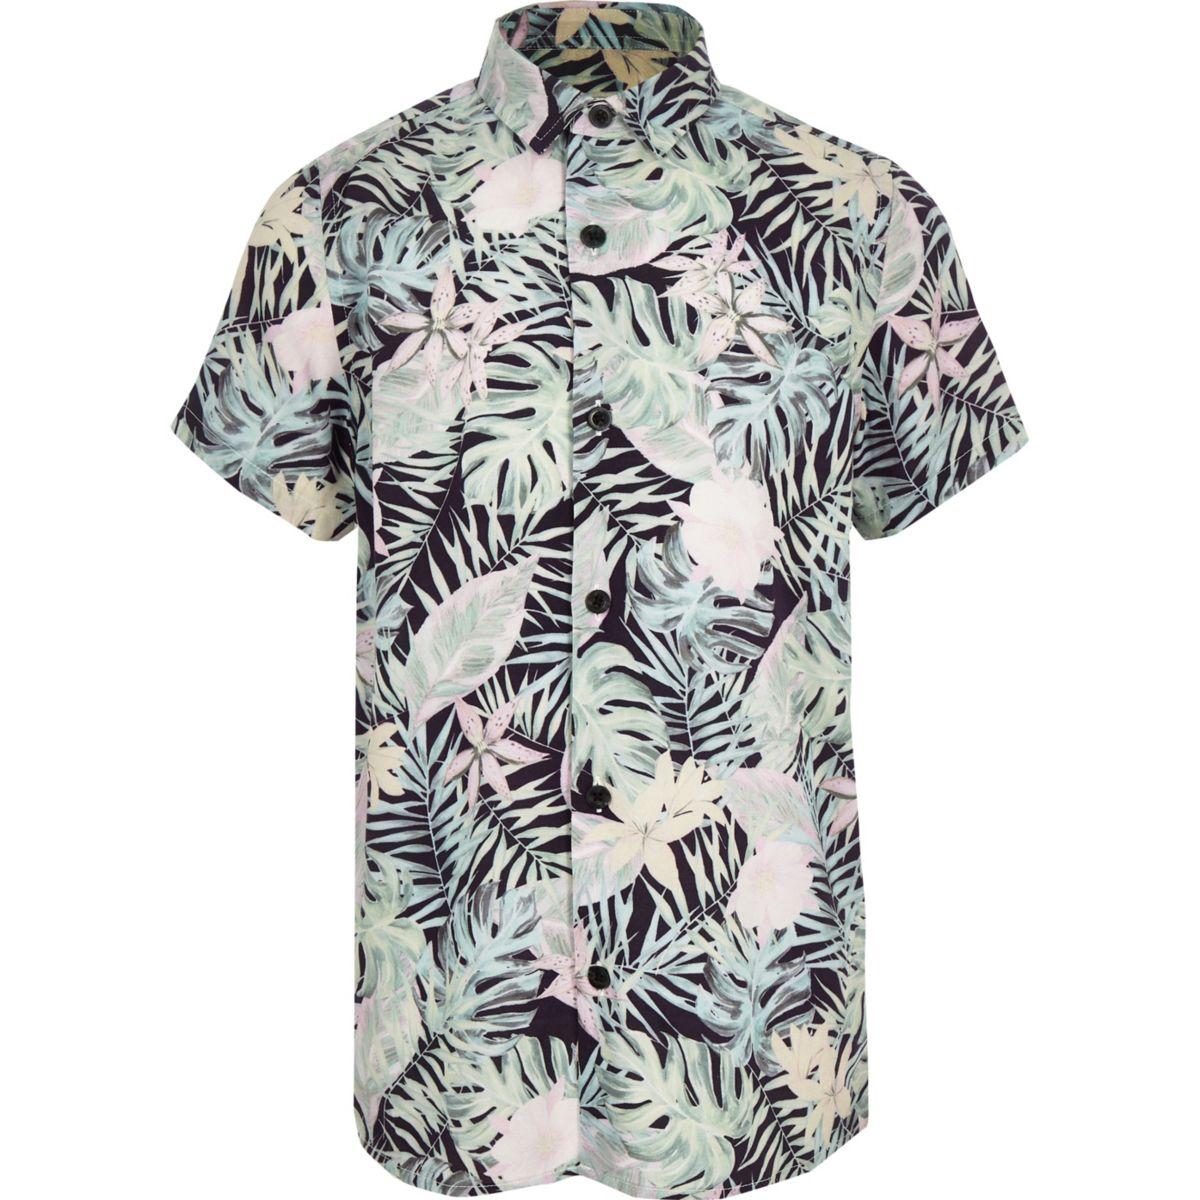 Boys pink floral short sleeve shirt